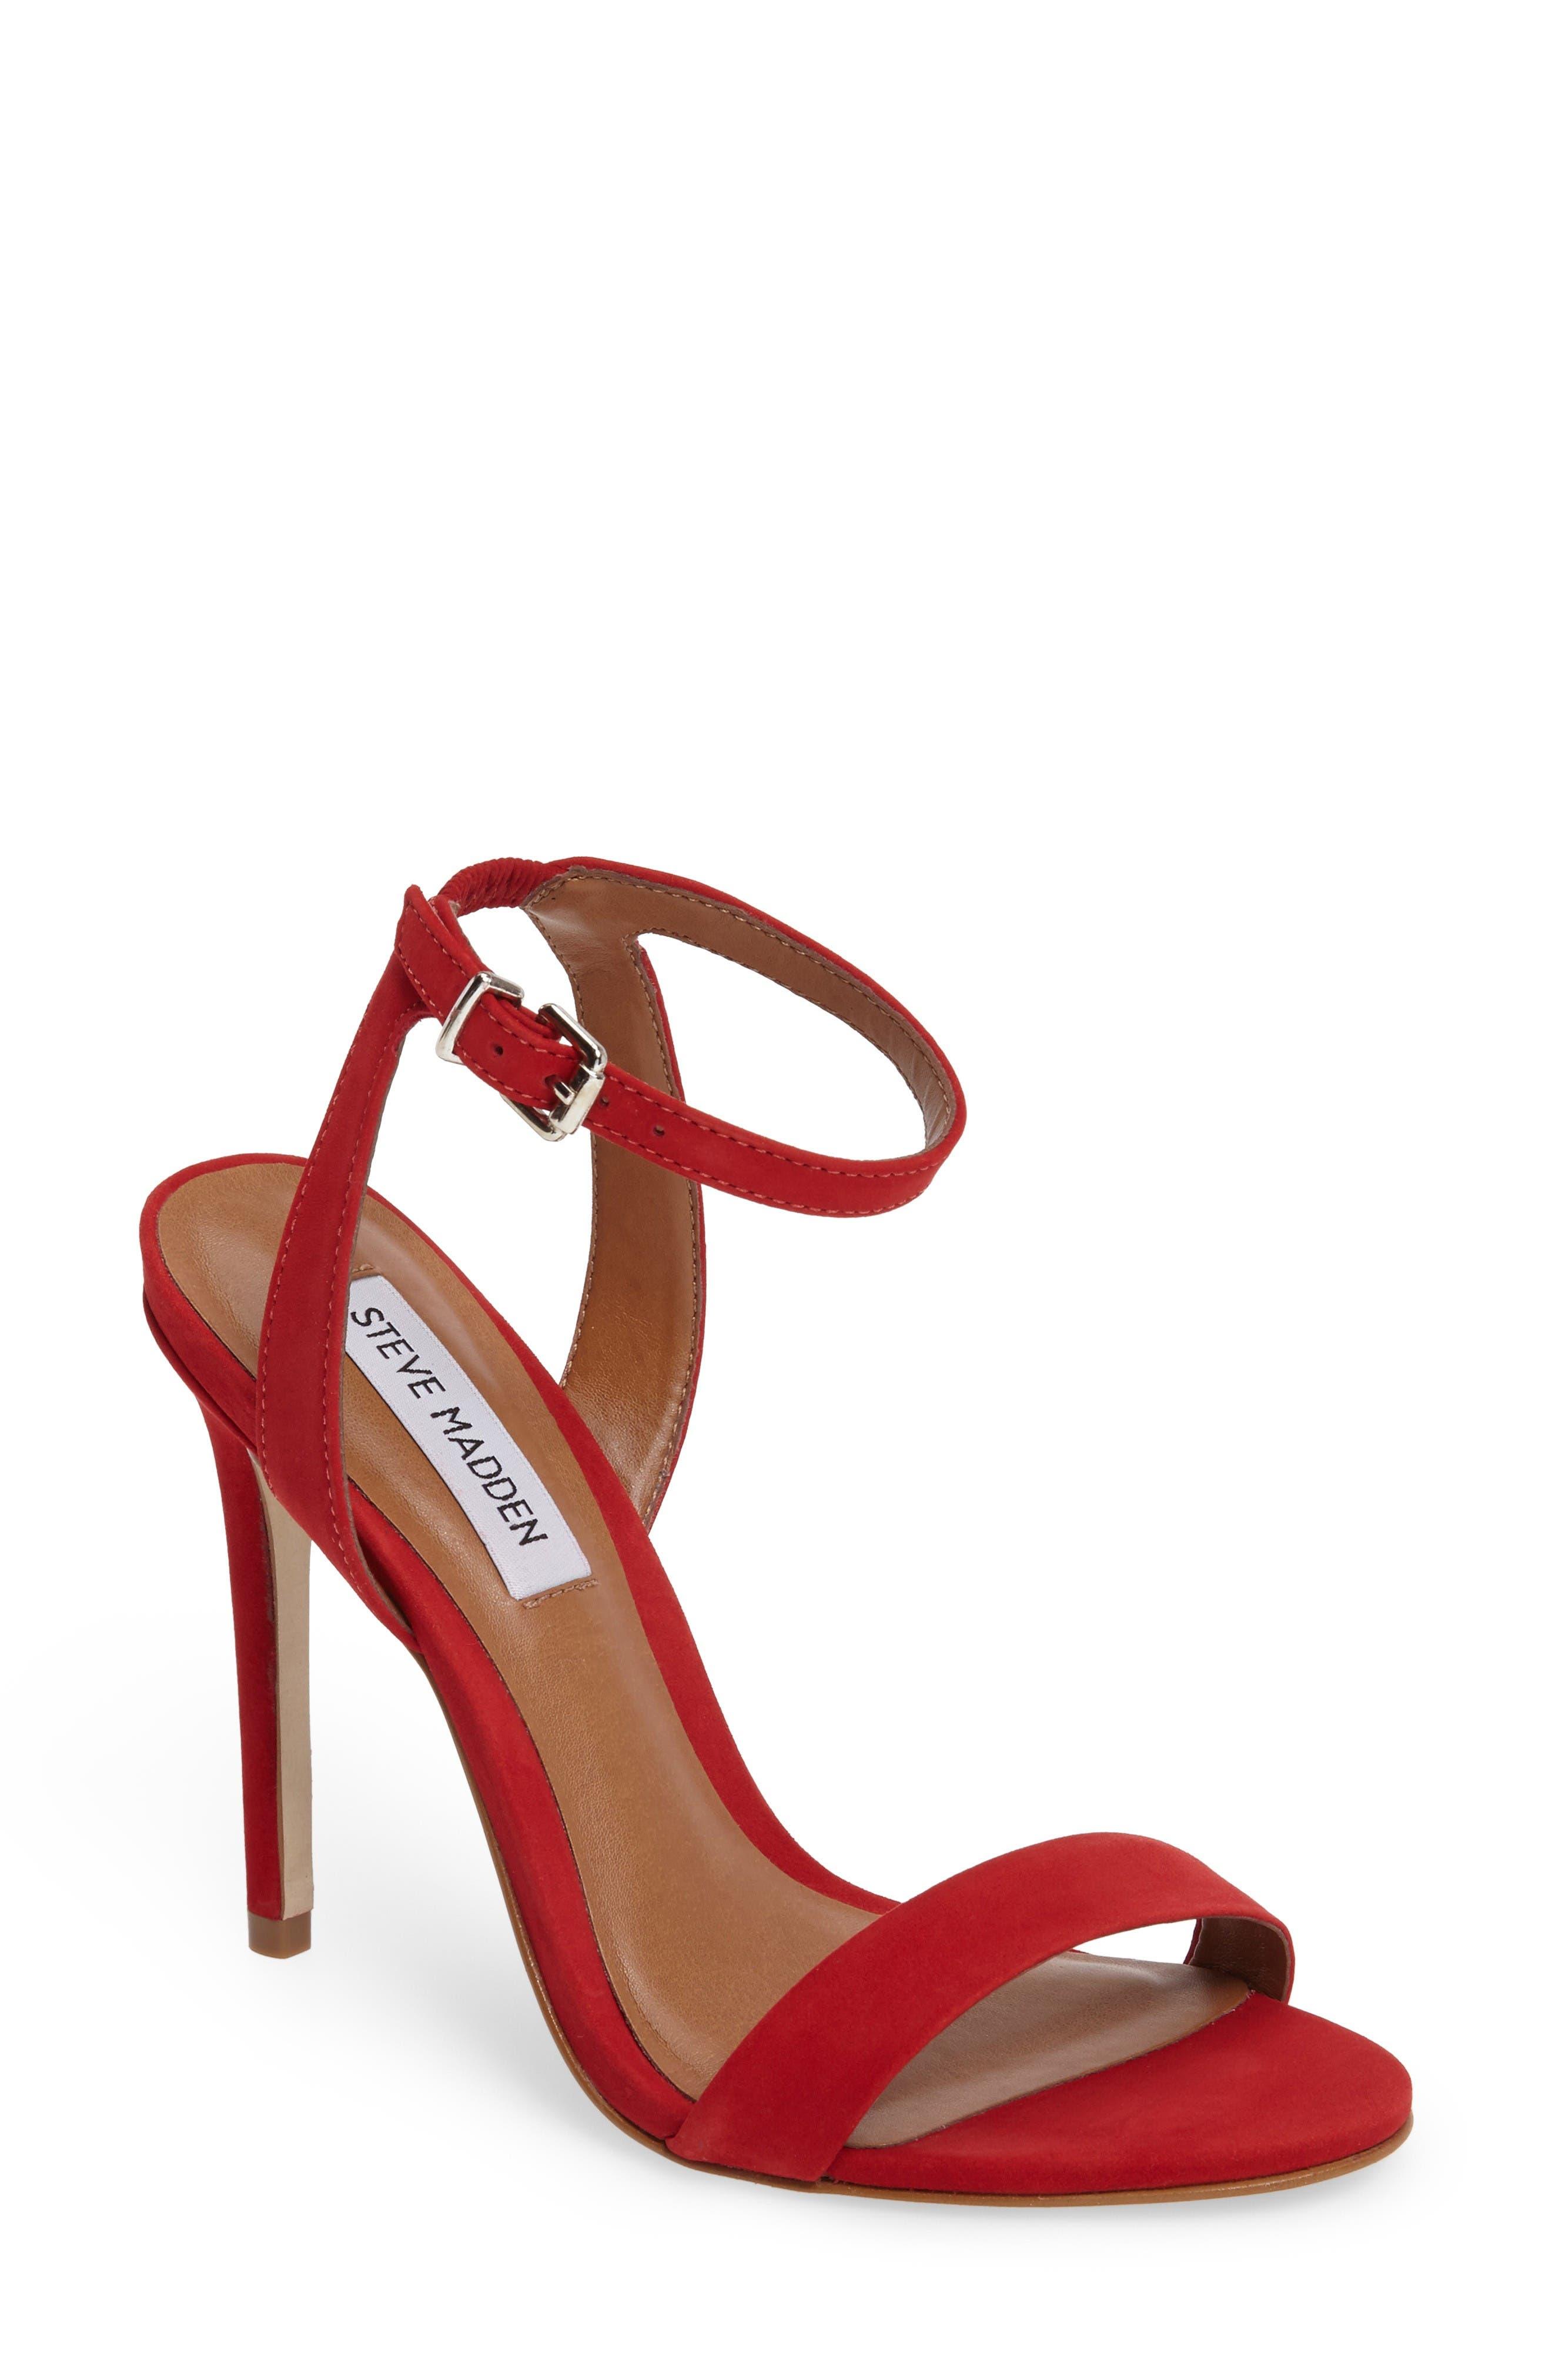 Red Womens Heels zR3FN5ER